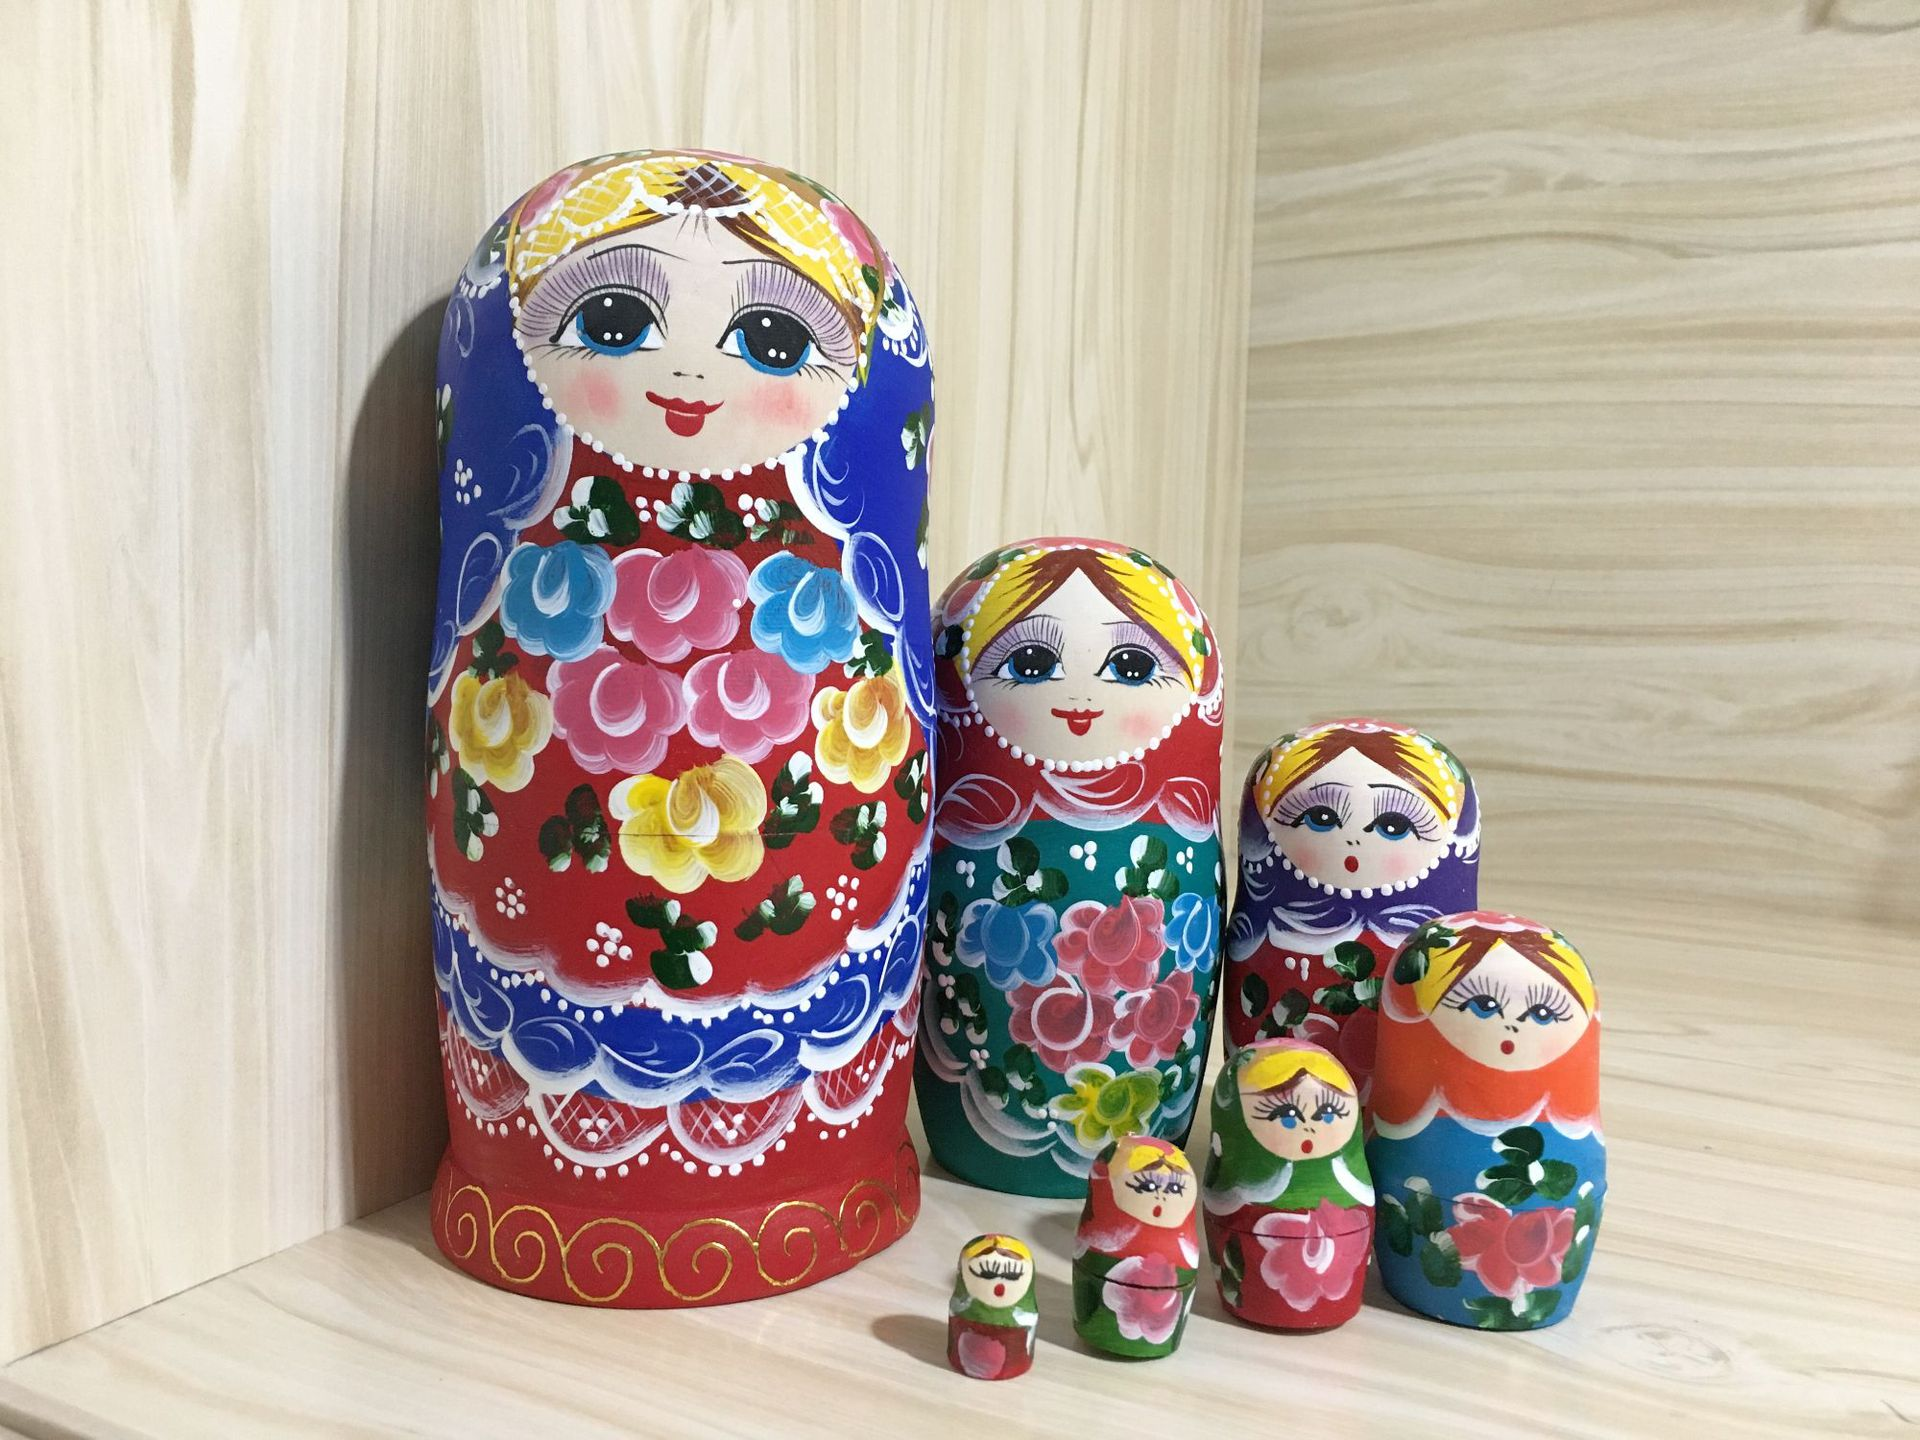 7-Layered Russian Matryoshka Doll for Home Decoration